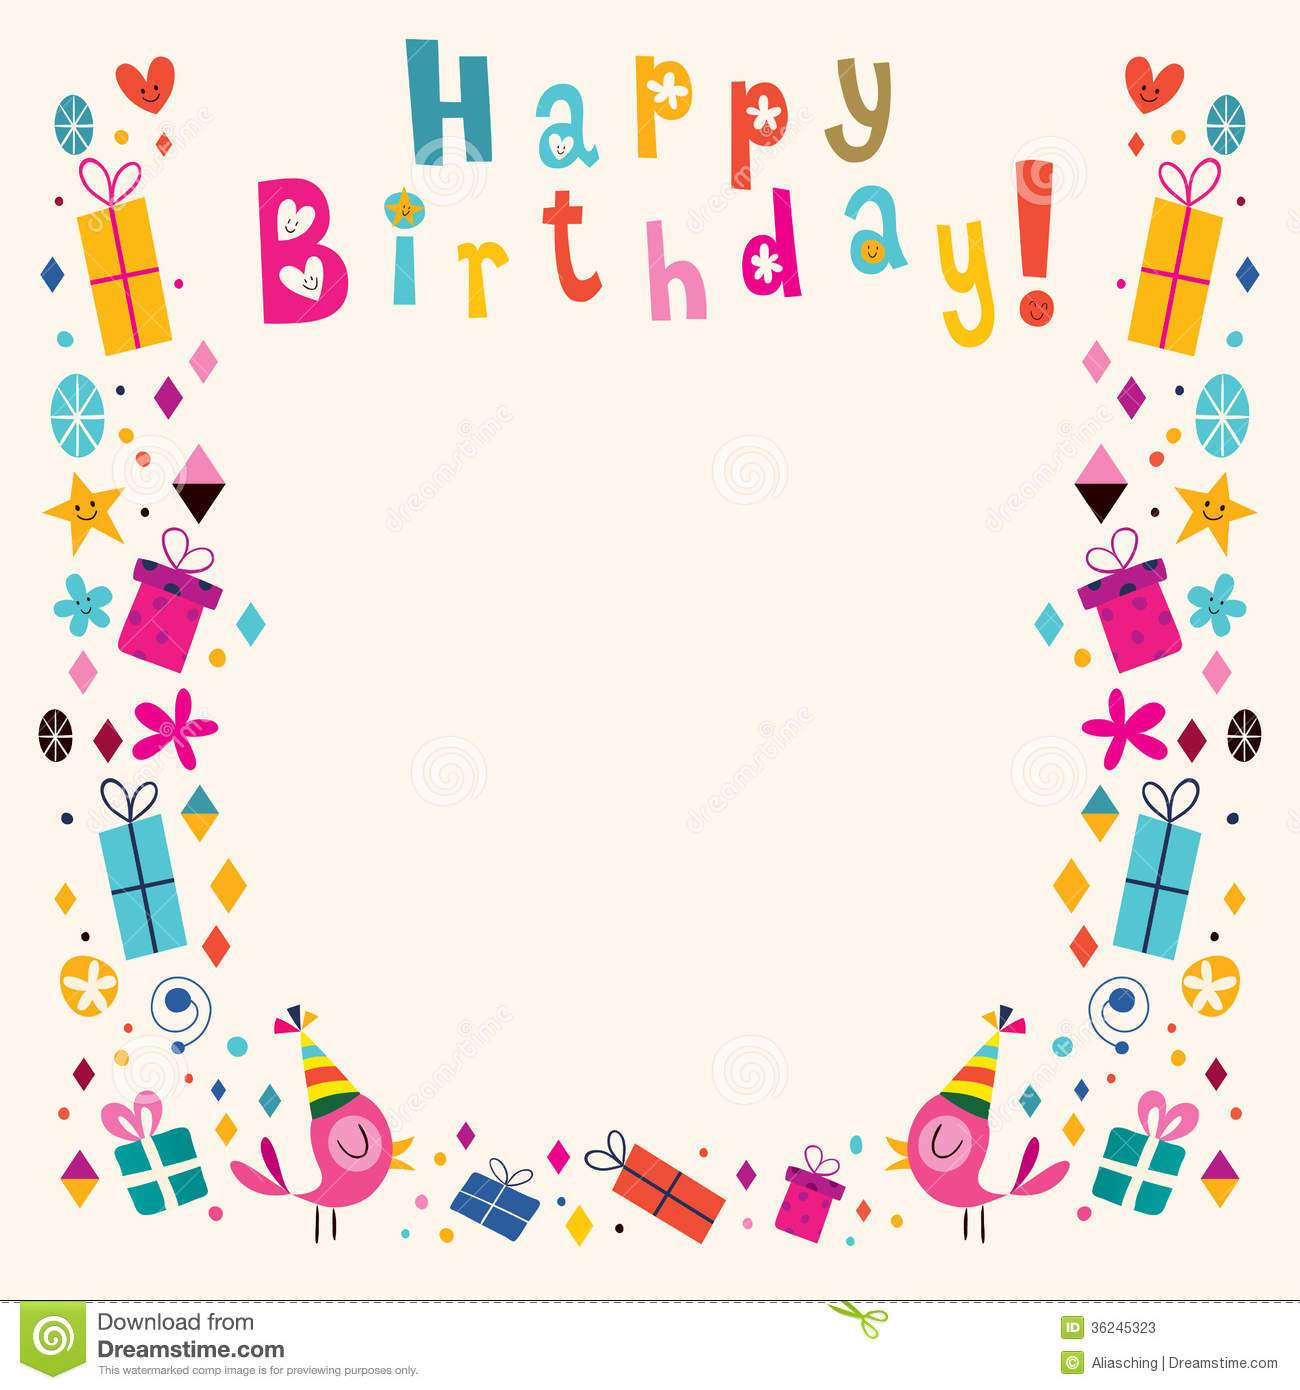 Happy birthday clipart frame clip art royalty free Happy birthday frame clipart 3 » Clipart Portal clip art royalty free